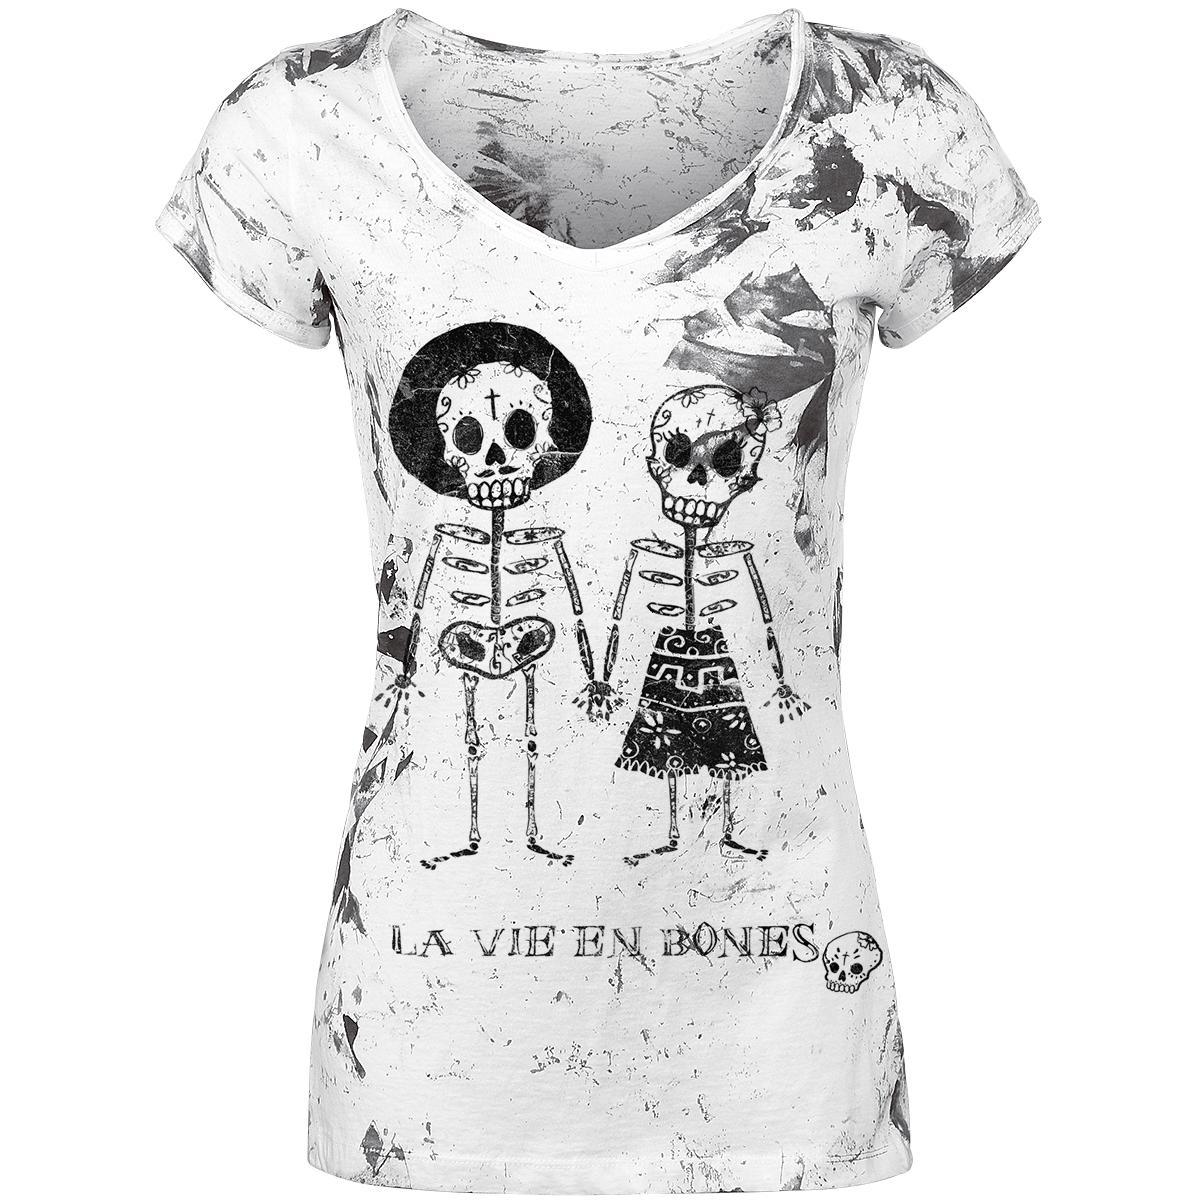 Skeleton Lovers T-shirt Design tee